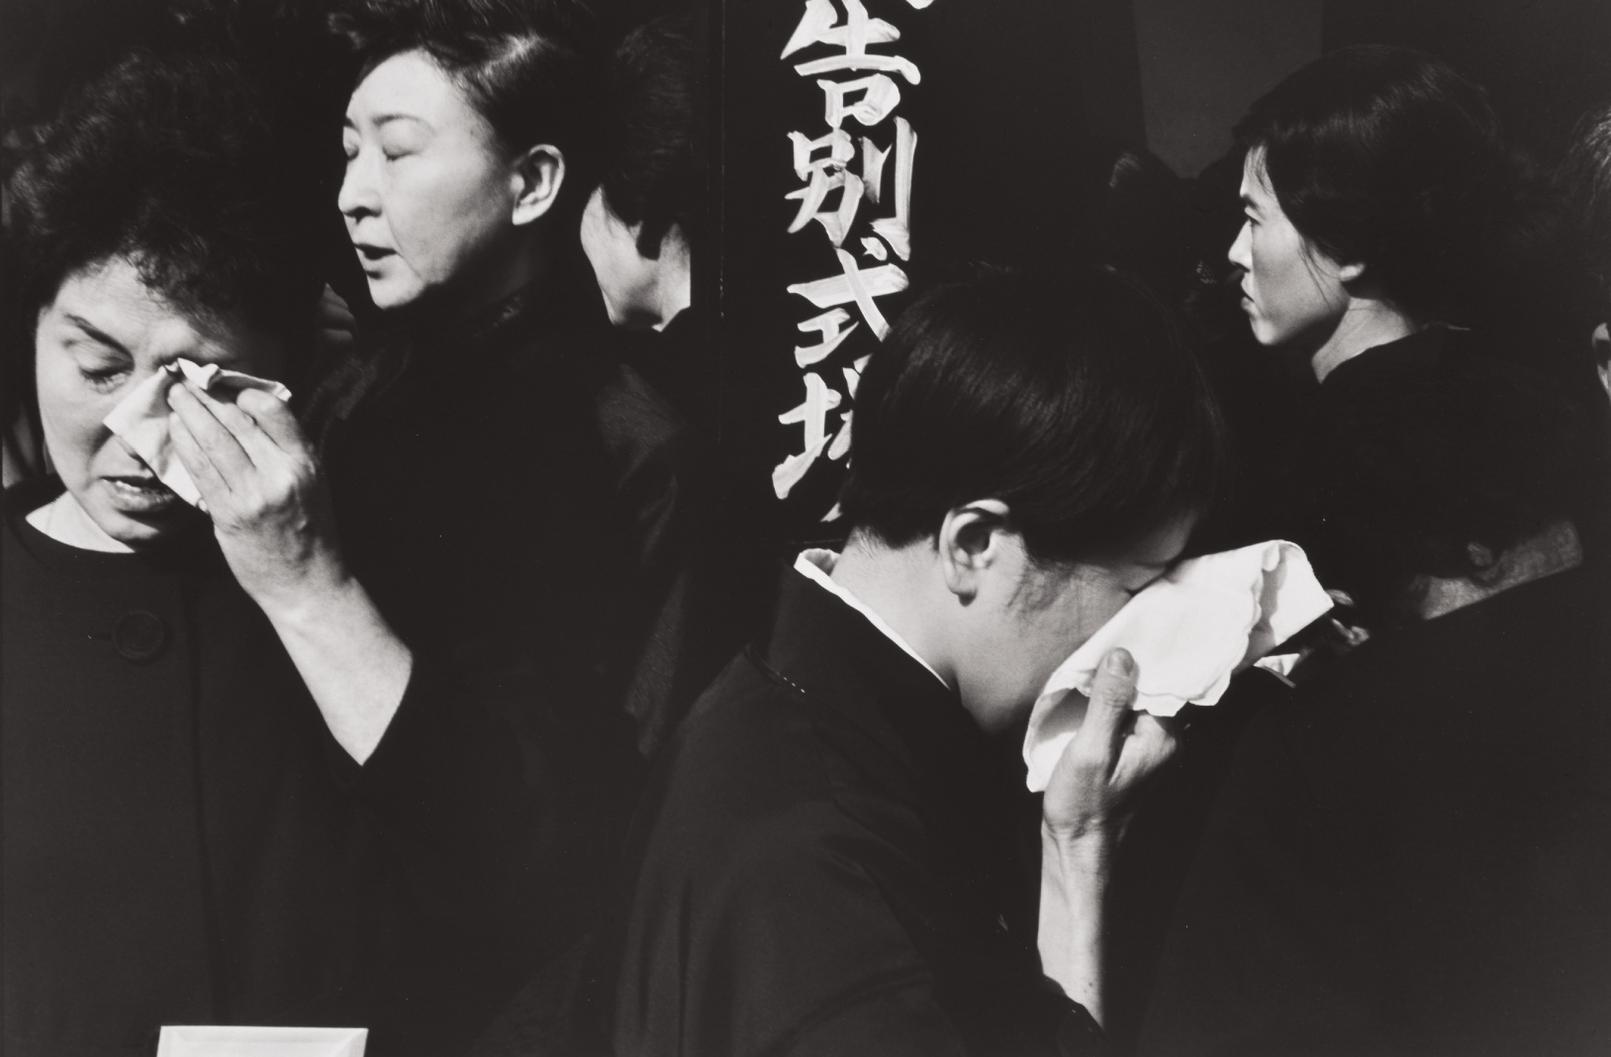 Henri Cartier-Bresson-Shinto Funeral For The Late Kabuki Actor, Ichikawa Danjuro Xi, Tokyo, Japan-1965